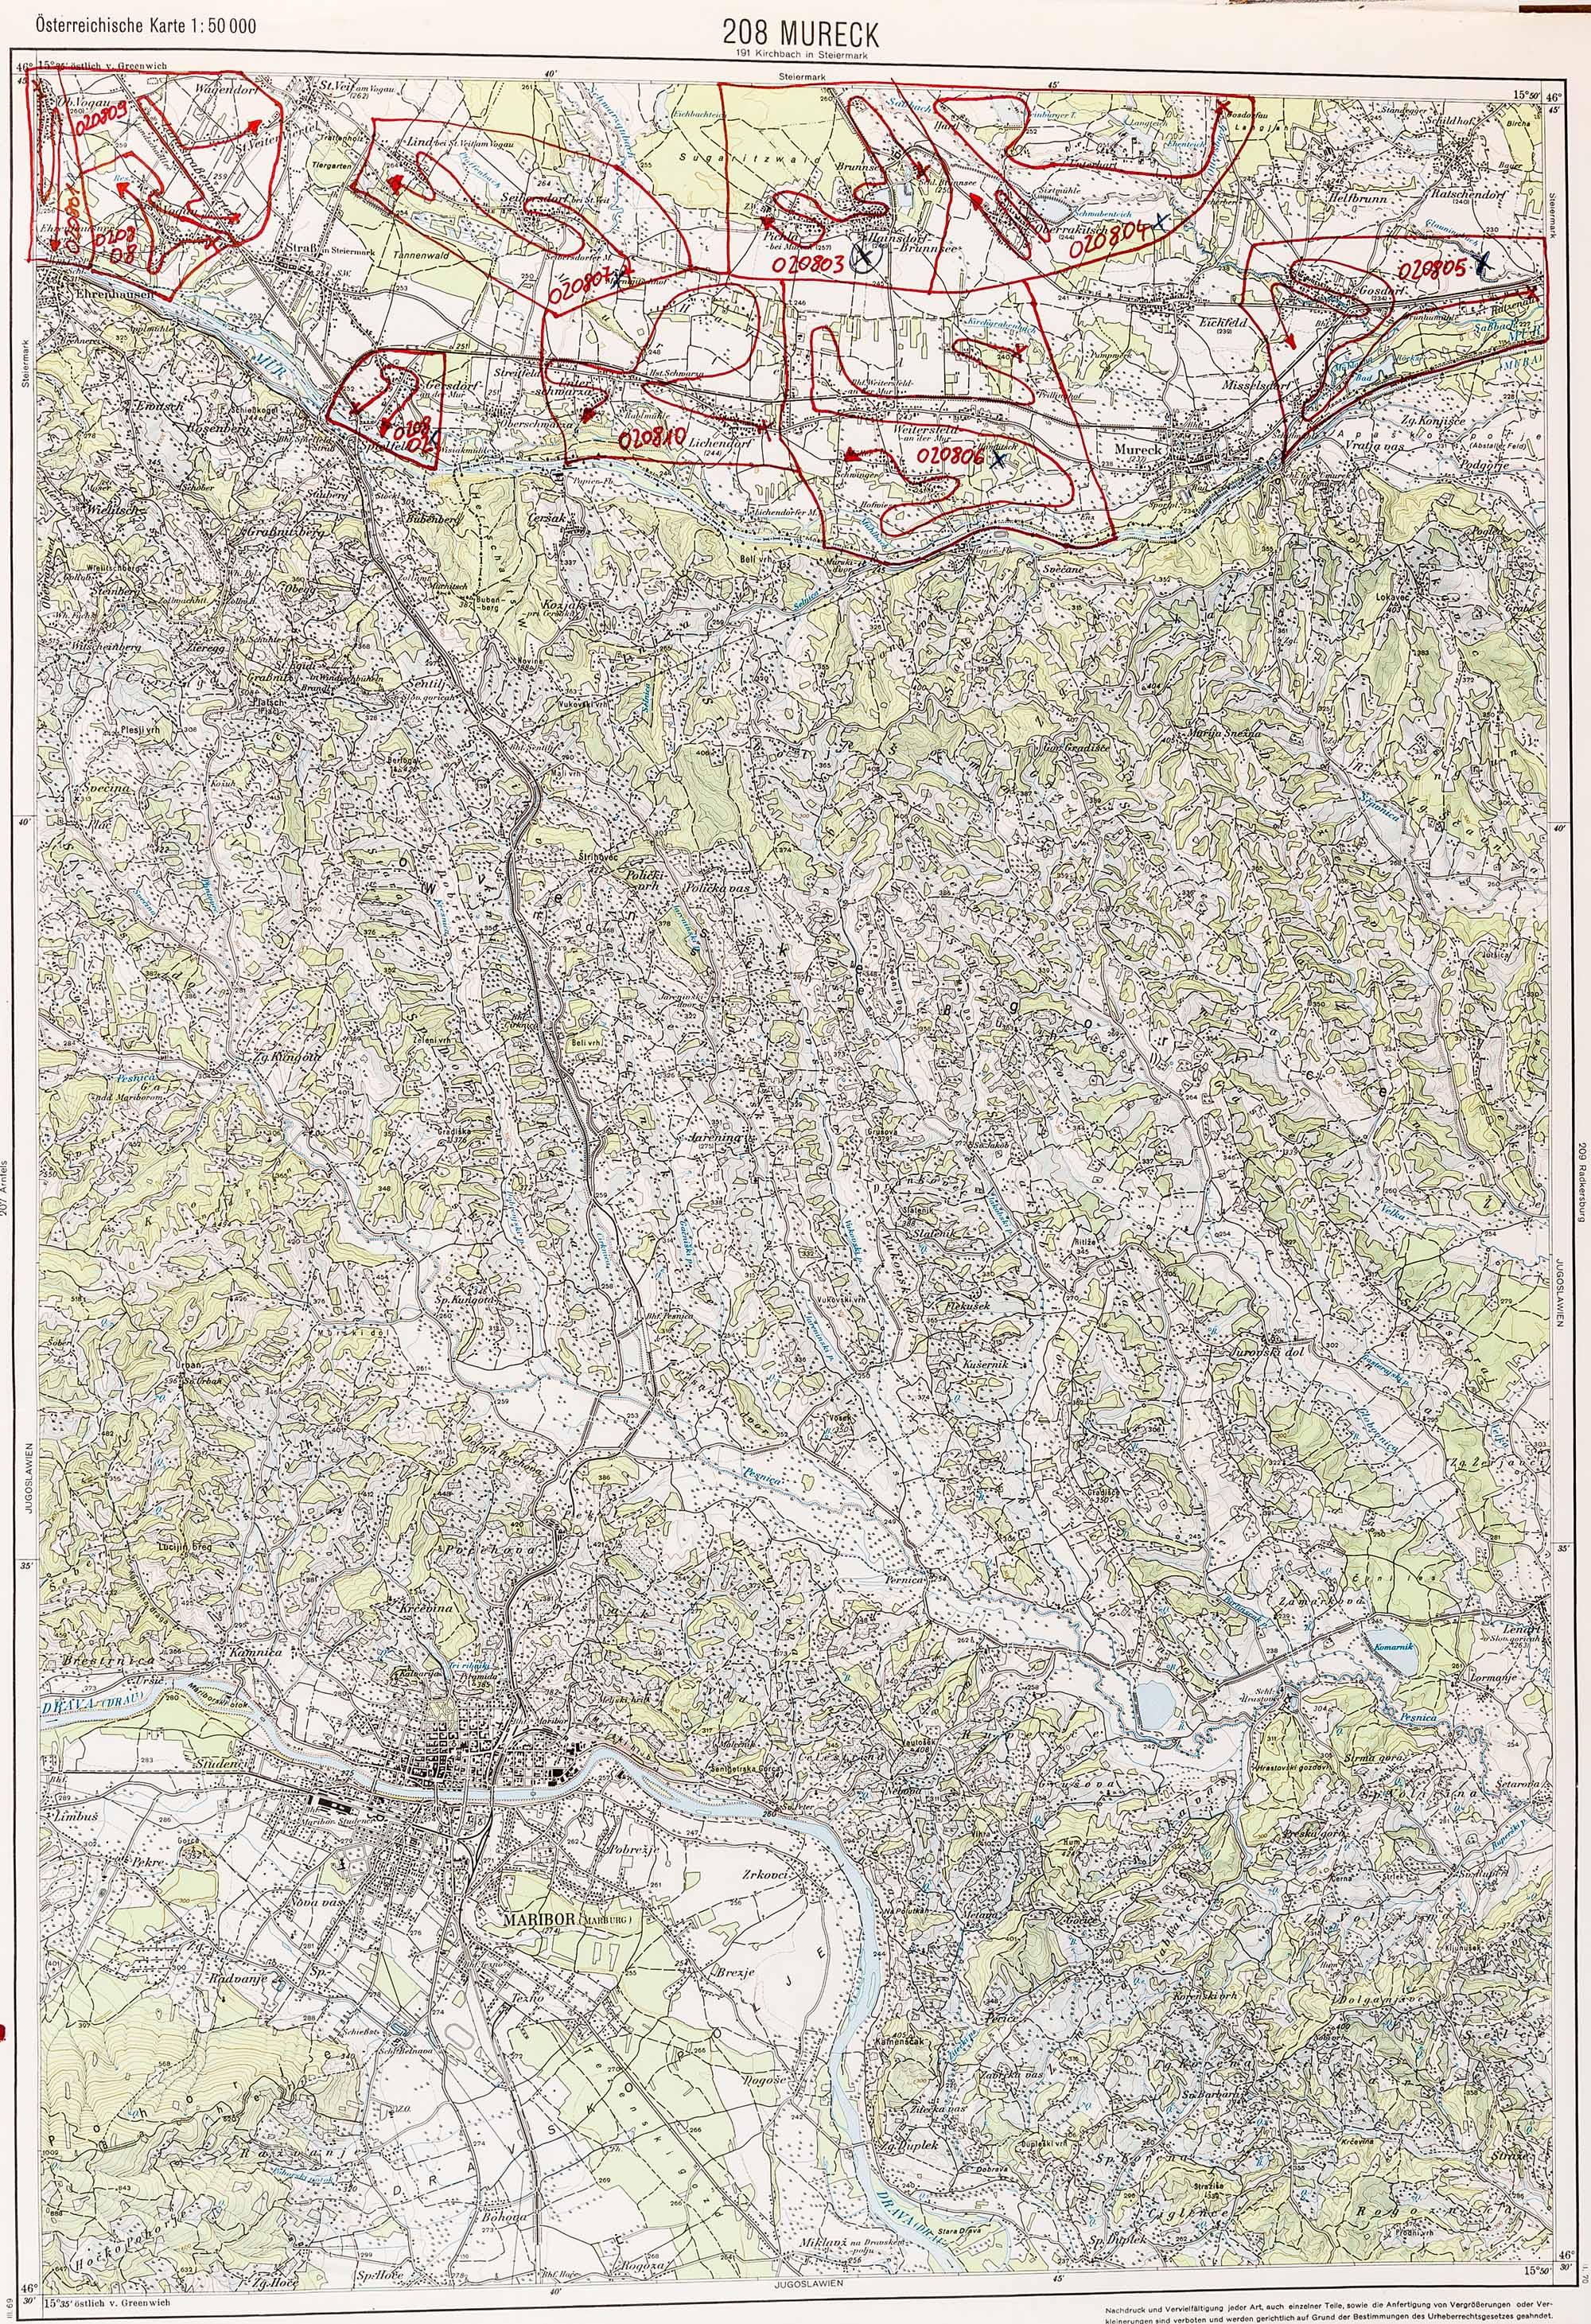 1979-1982 Karte 208